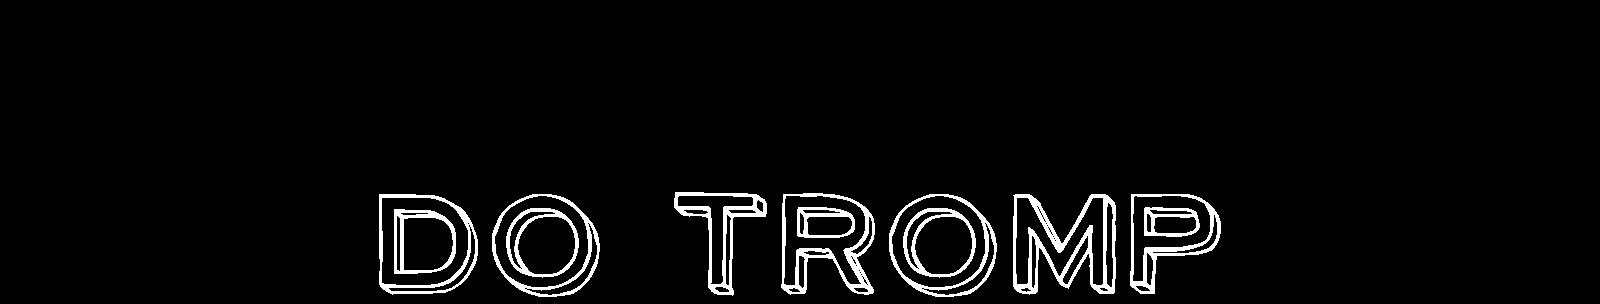 Do Tromp